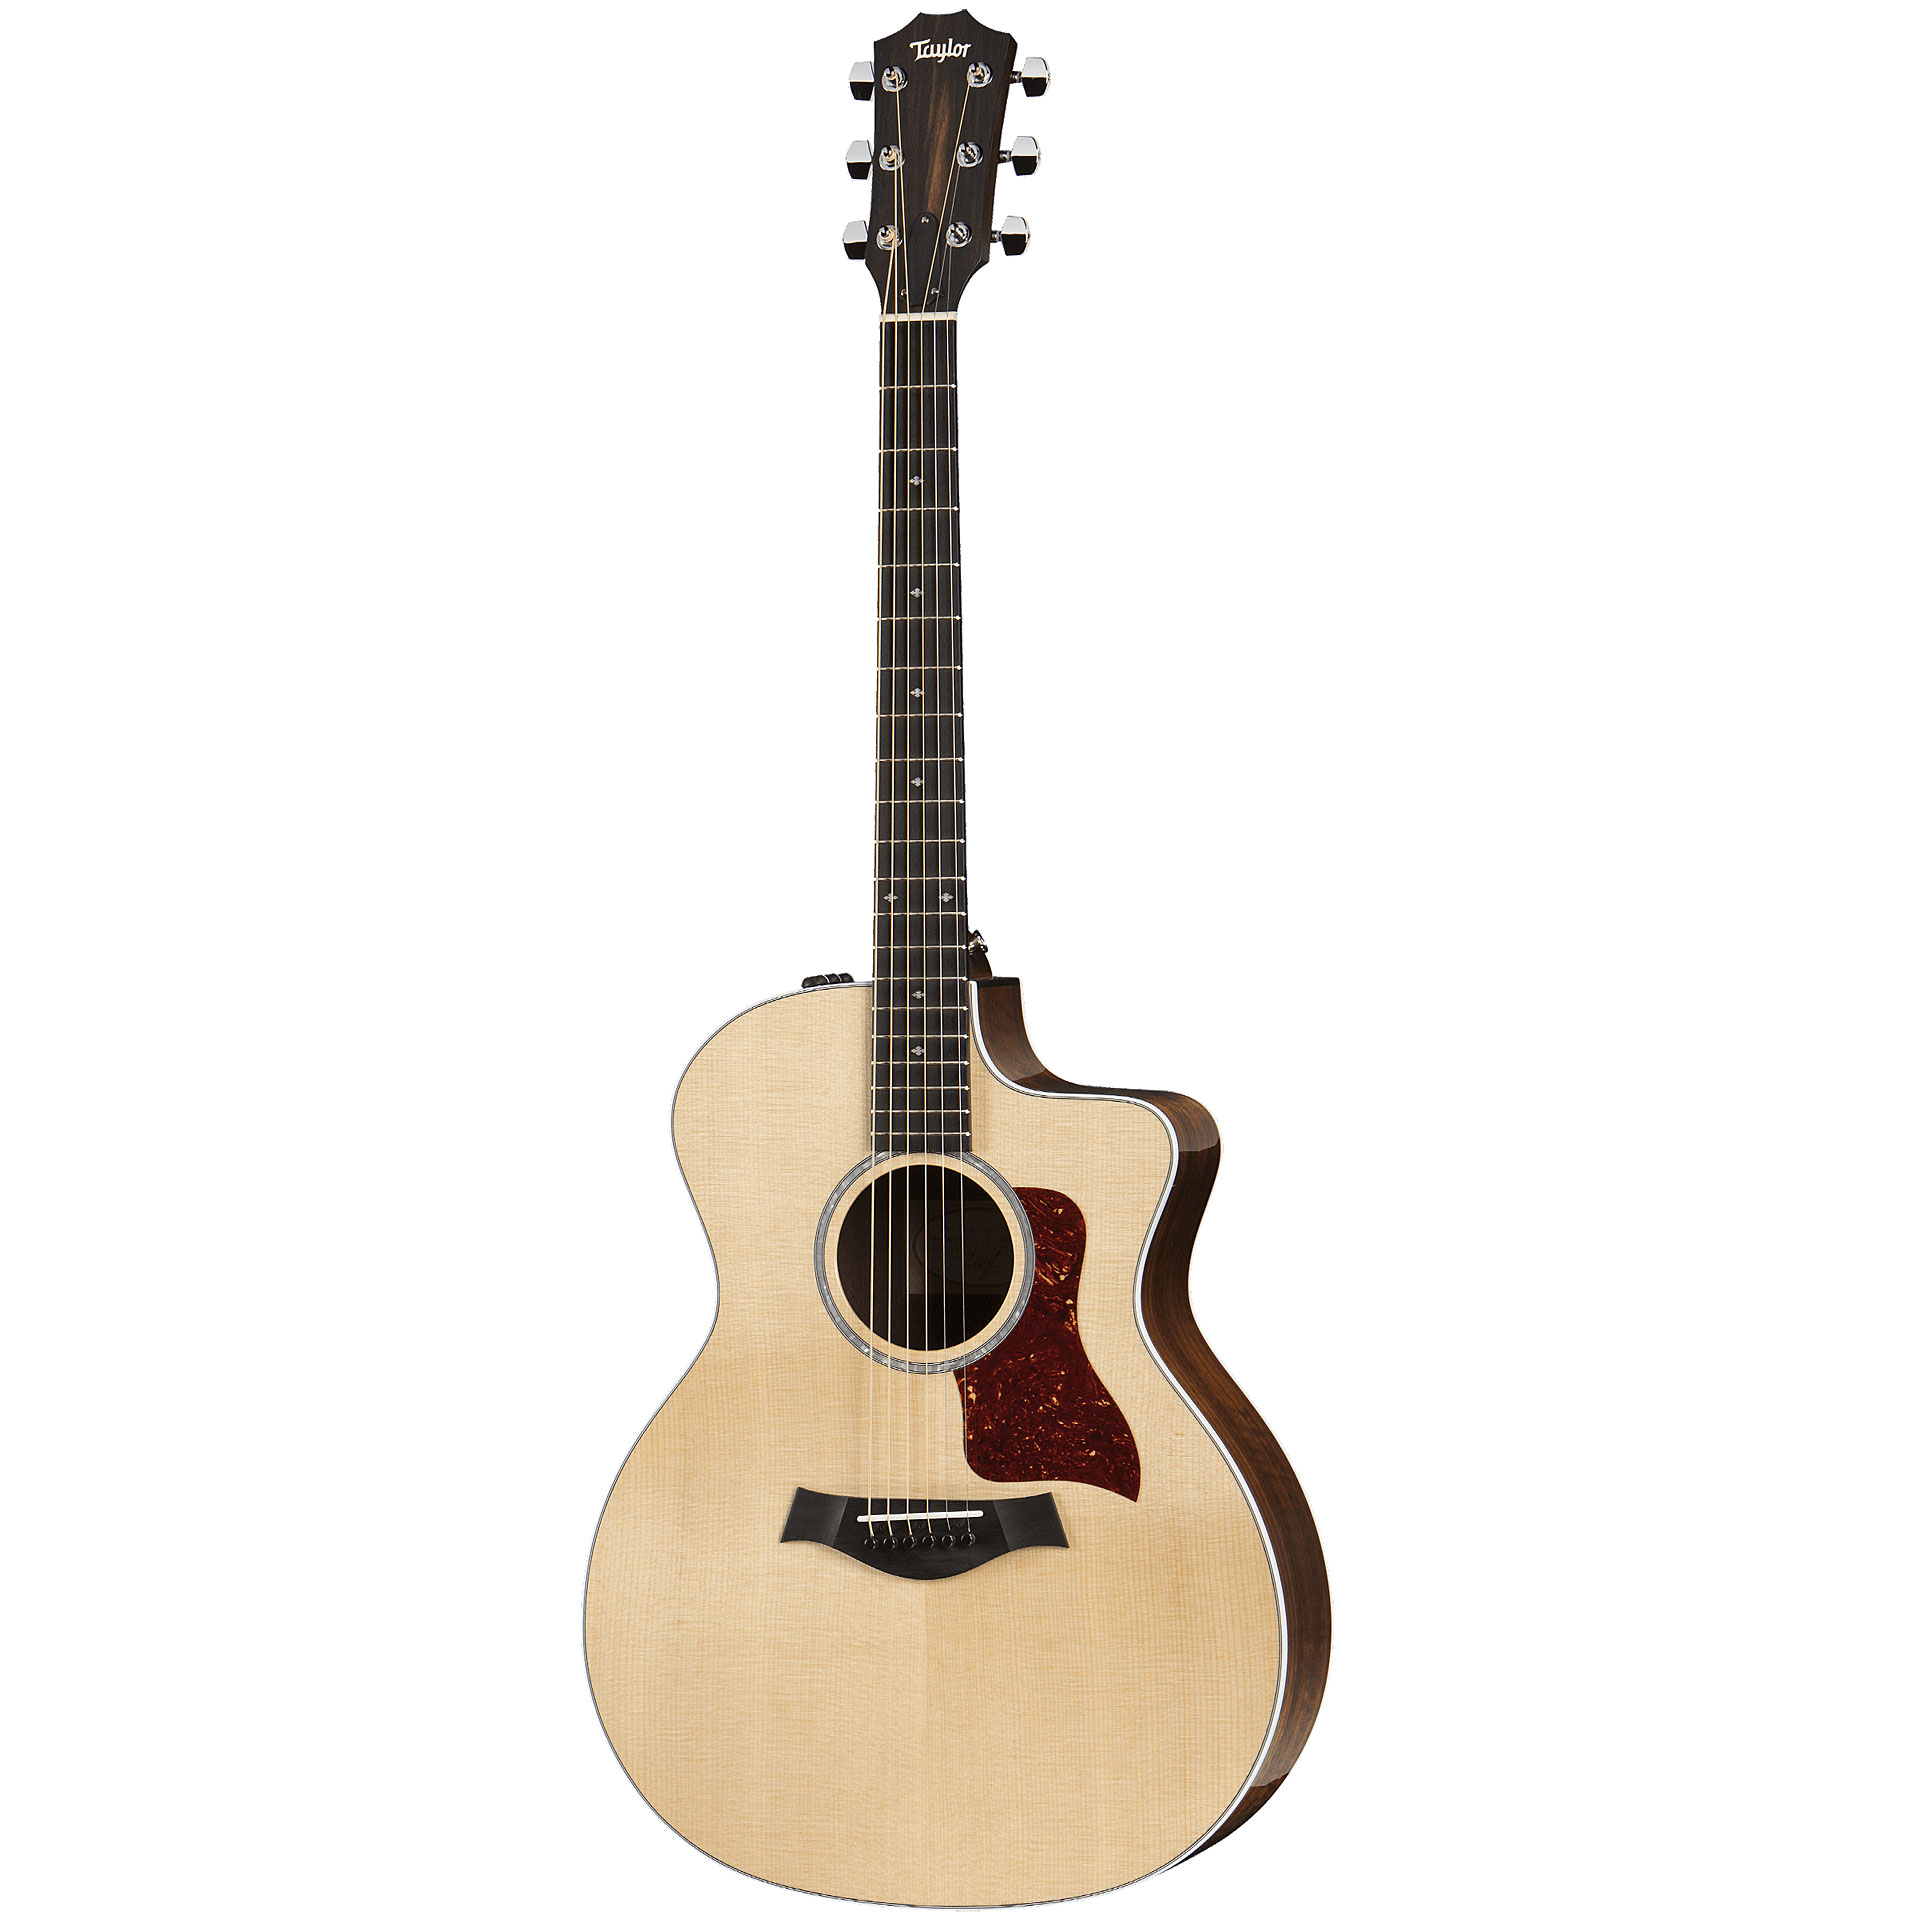 taylor 214ce cf dlx 10105355 acoustic guitar. Black Bedroom Furniture Sets. Home Design Ideas